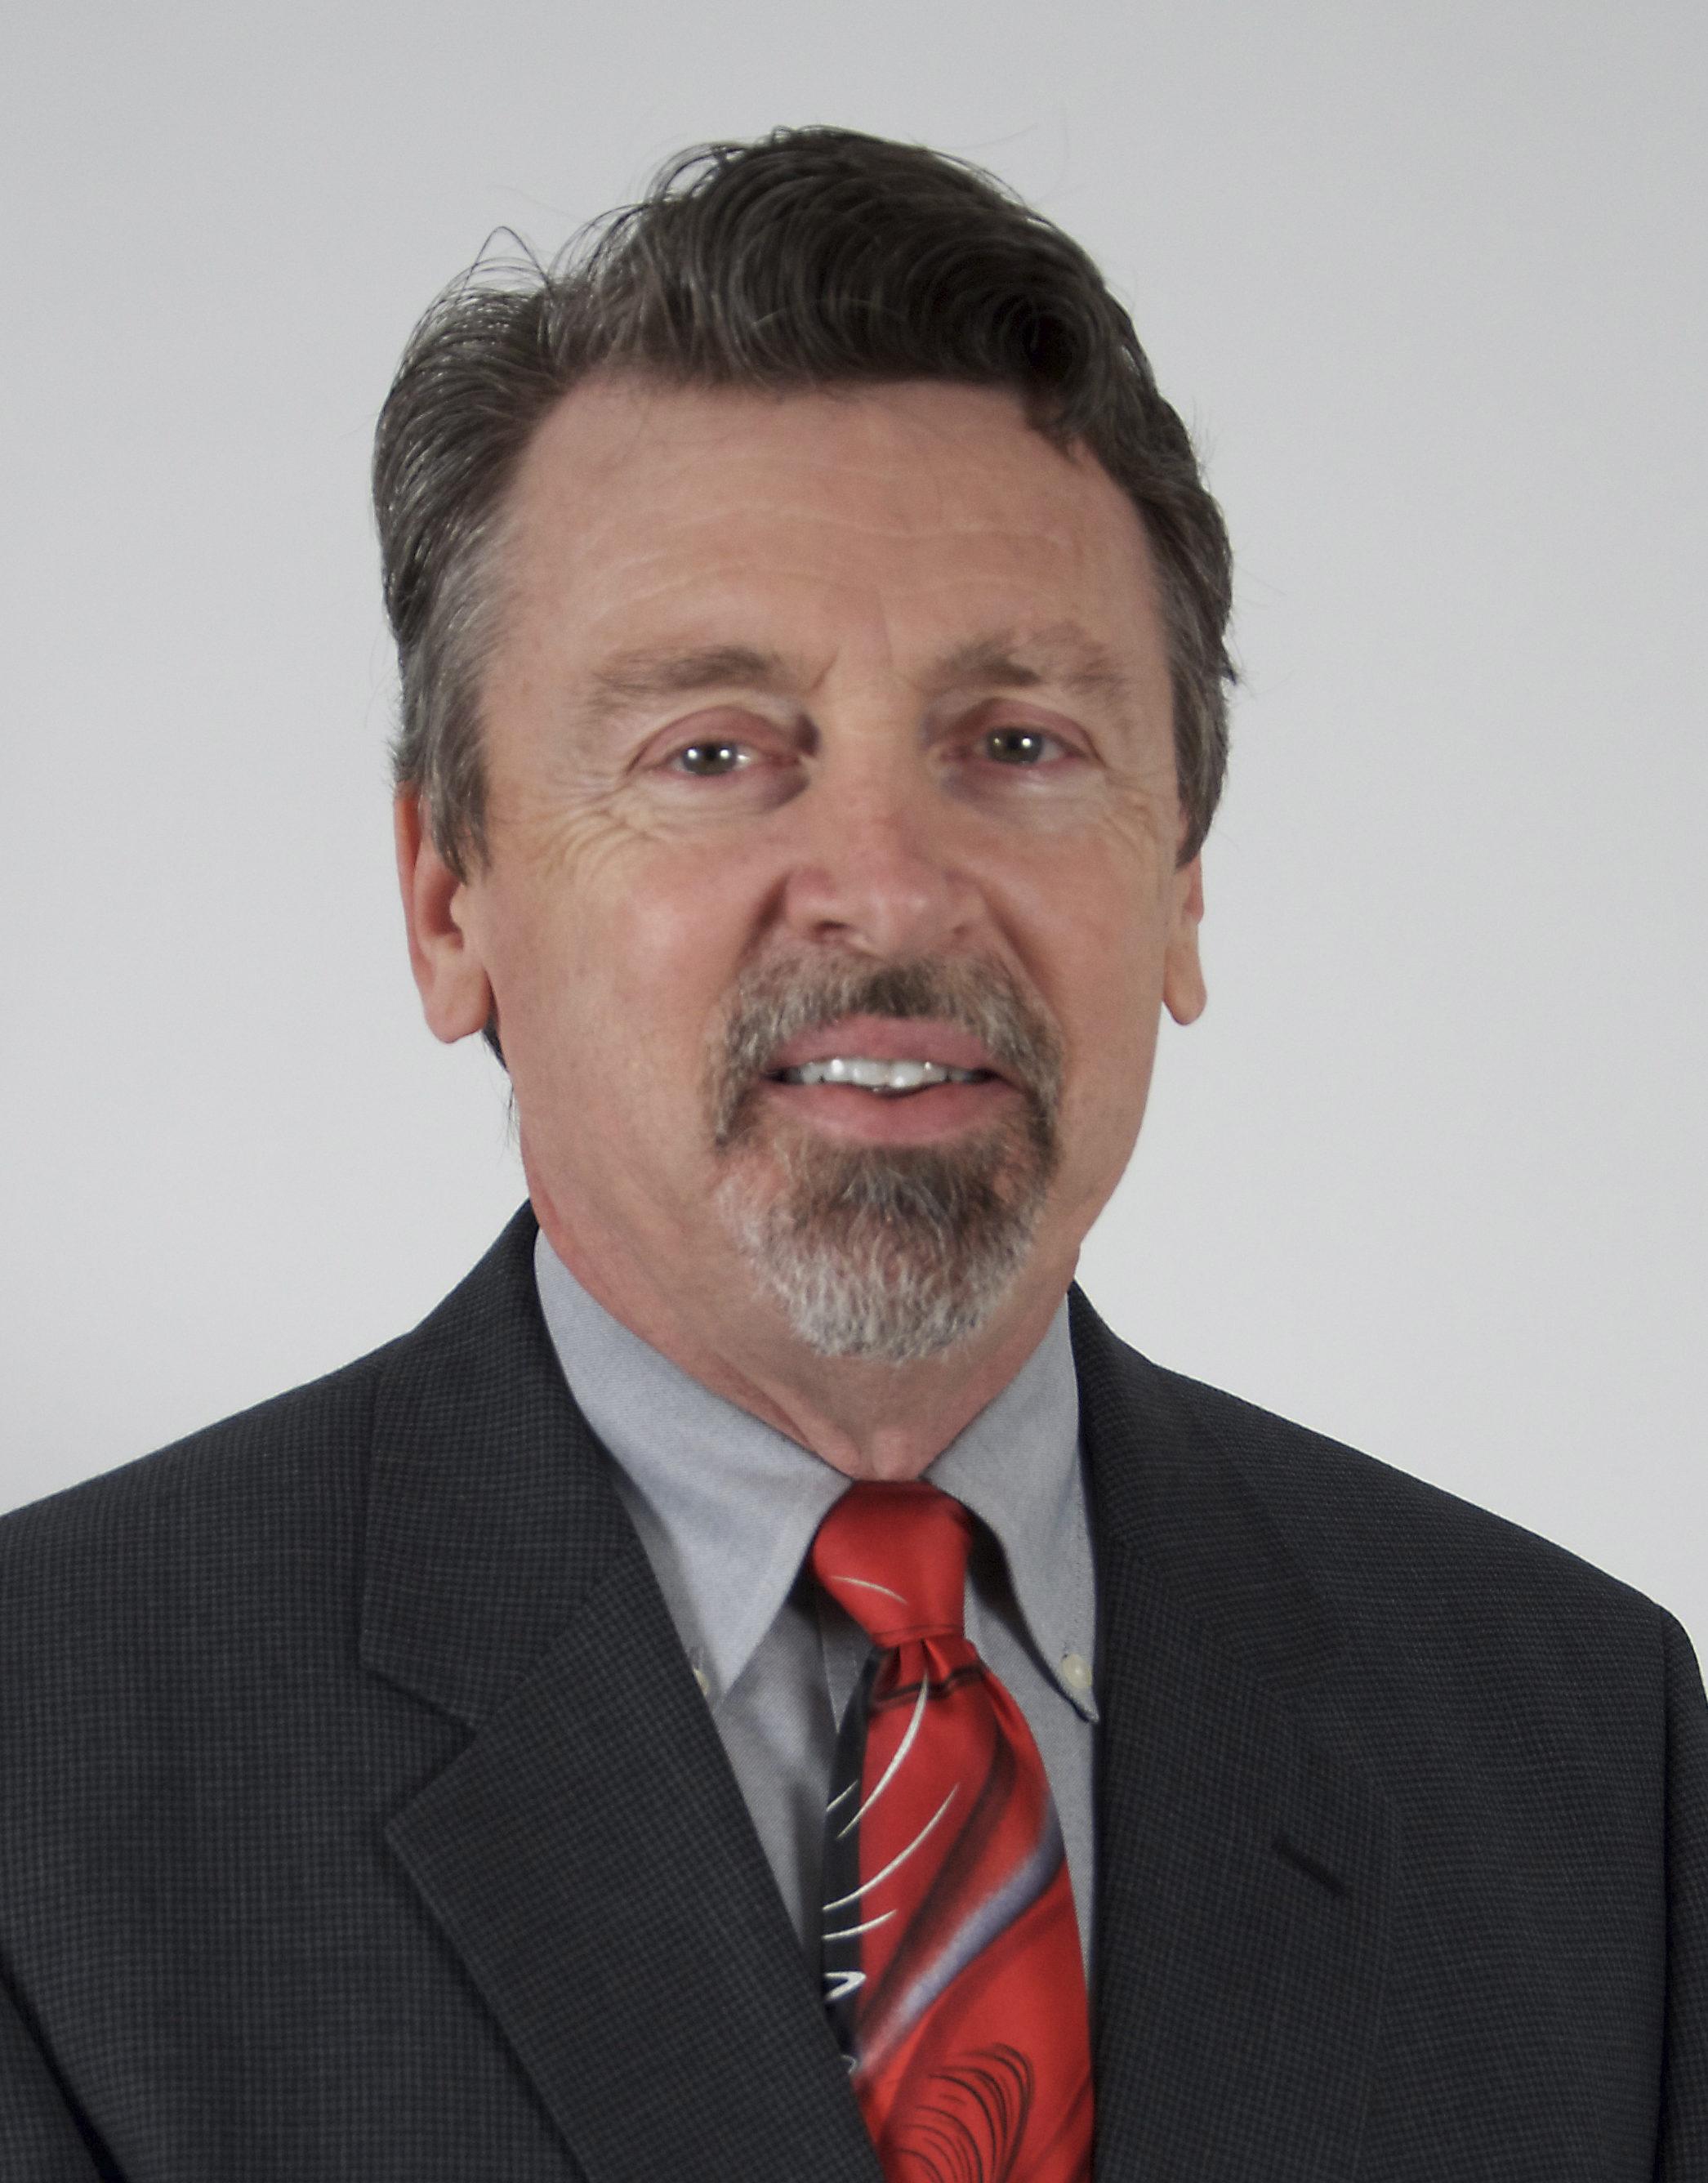 Jack Richmond